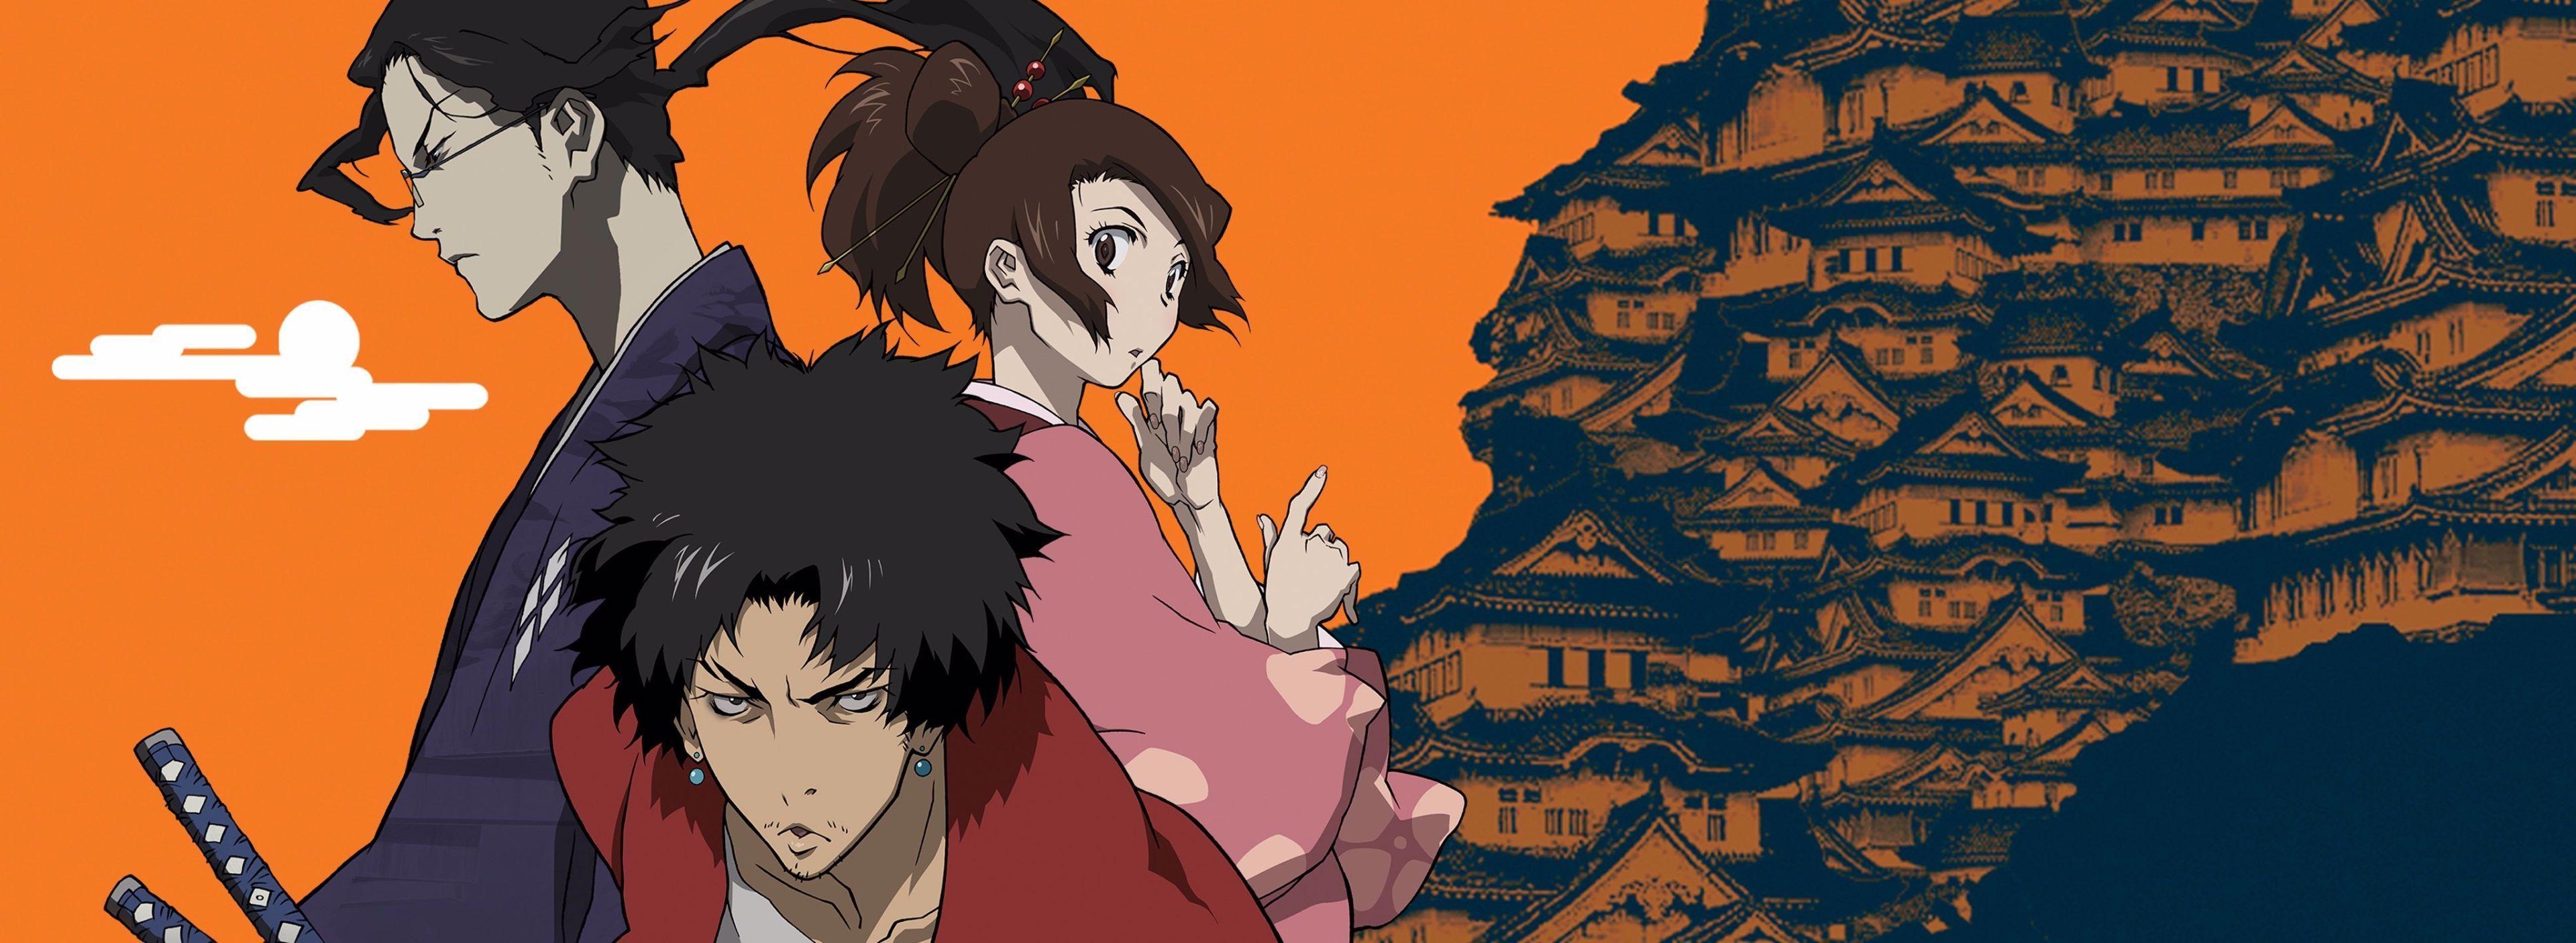 Anime Wallpaper Samurai Champloo 2740983 3840x1406 Samurai Champloo 4k Best Picture Ever Samurai Champloo Katana Samur In 2020 Samurai Champloo Anime Wallpaper Anime